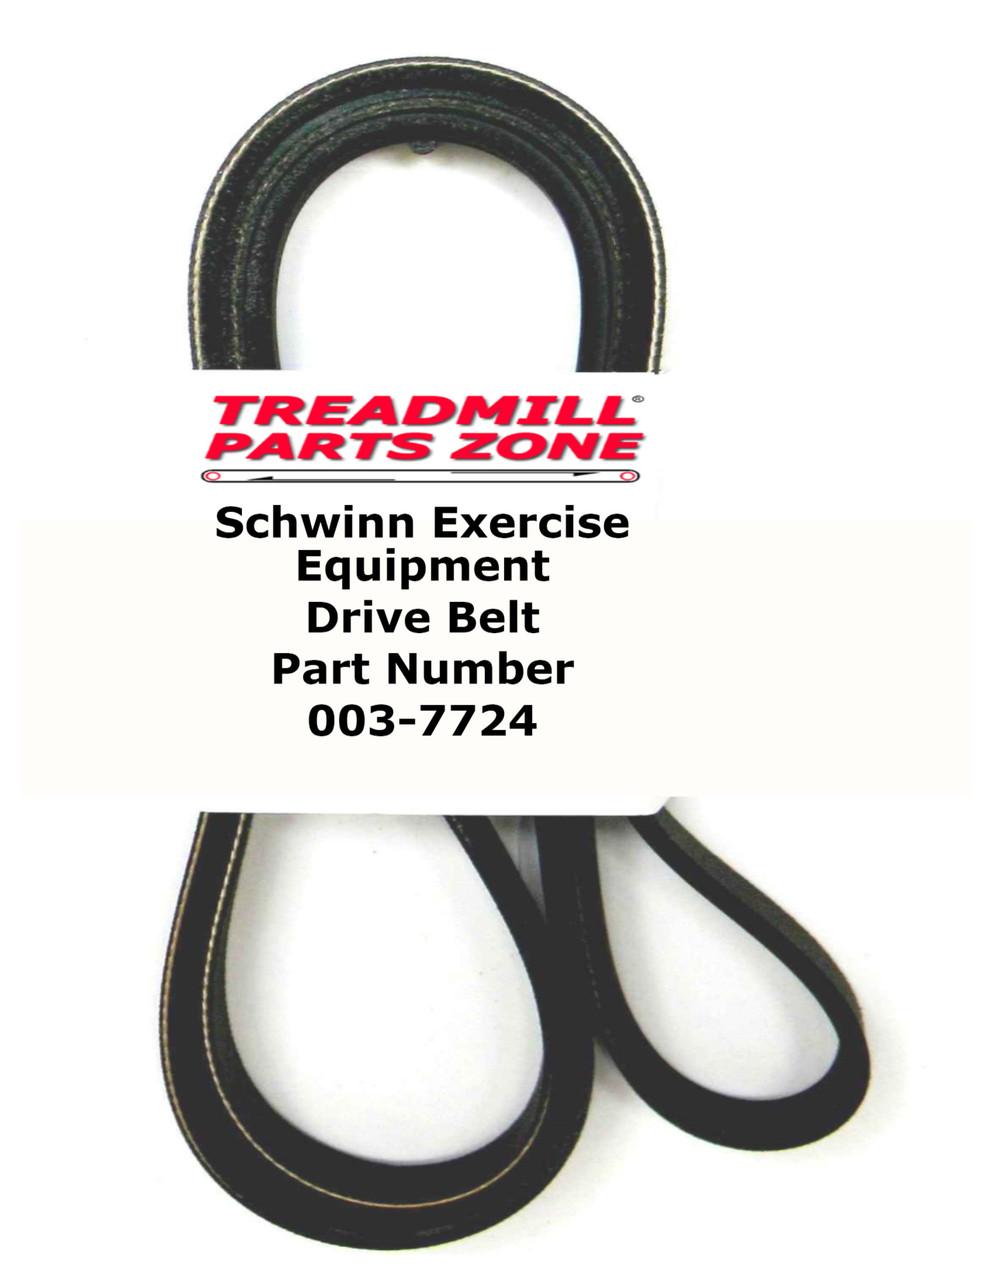 Schwinn Model A15 Upright Bike Drive Pulley Belt Part Number 003-7724